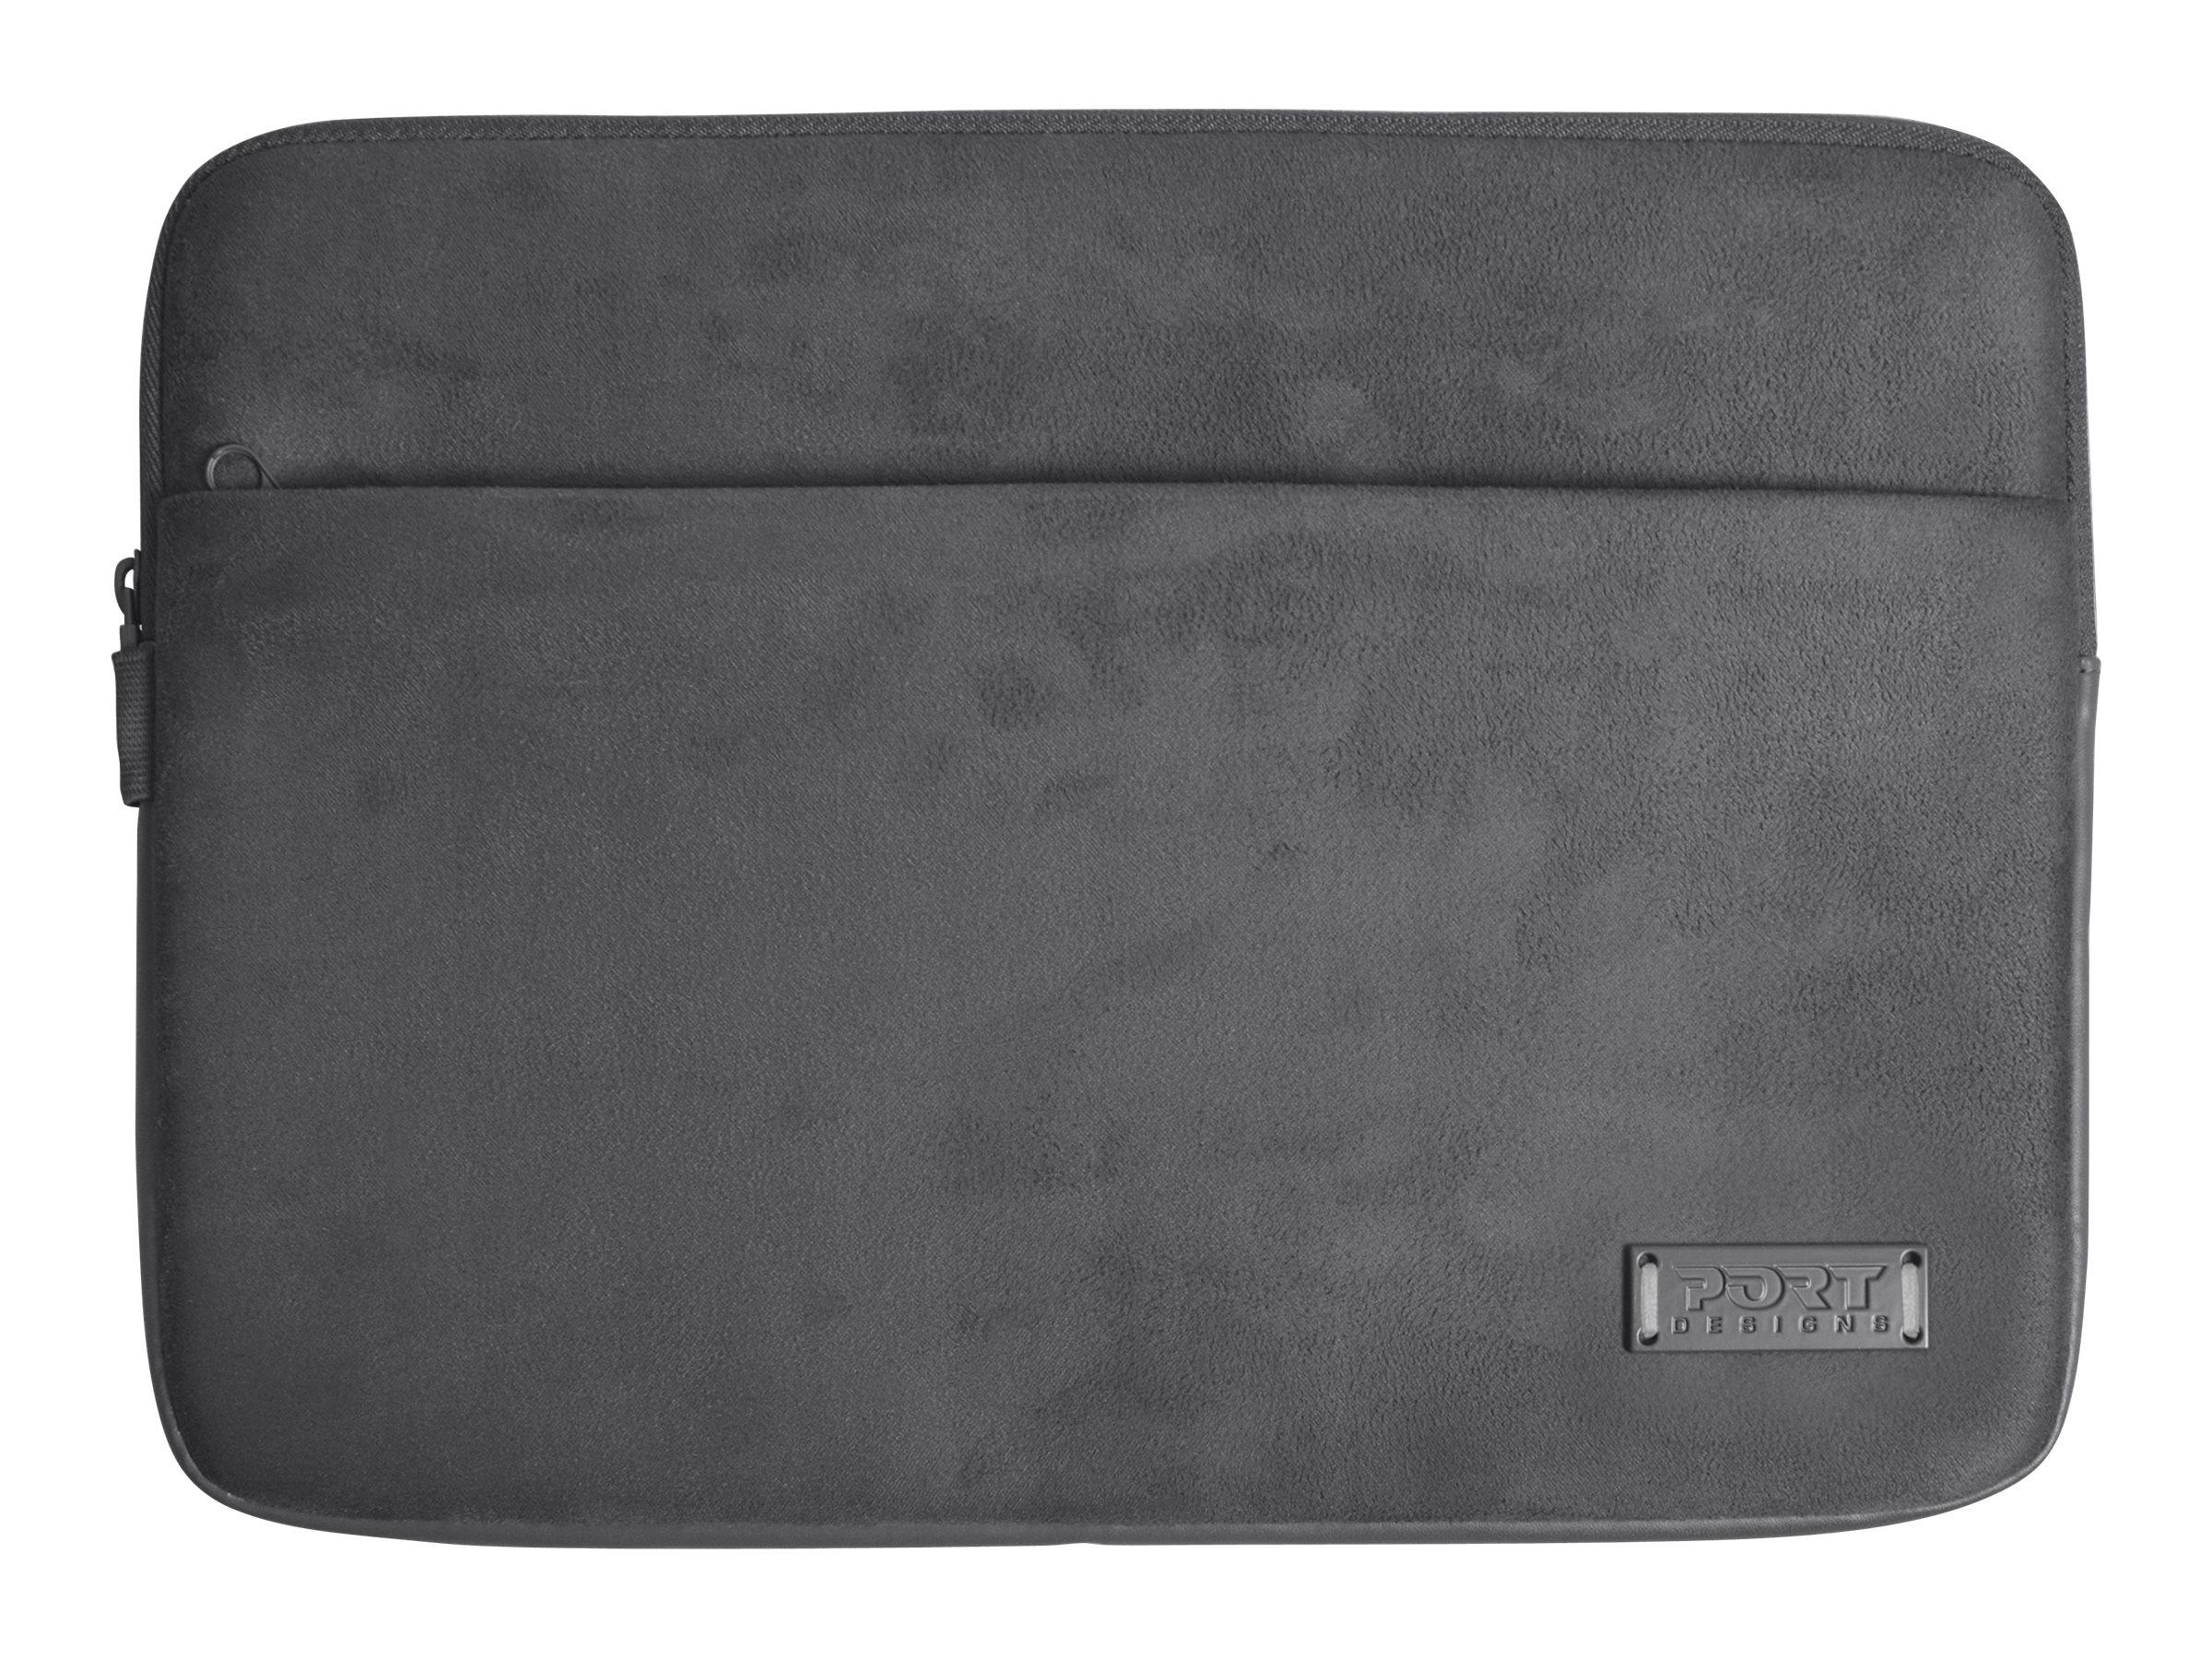 "PORT Designs PORT MILANO - Notebook-Hülle - 30.5 cm (12"")"